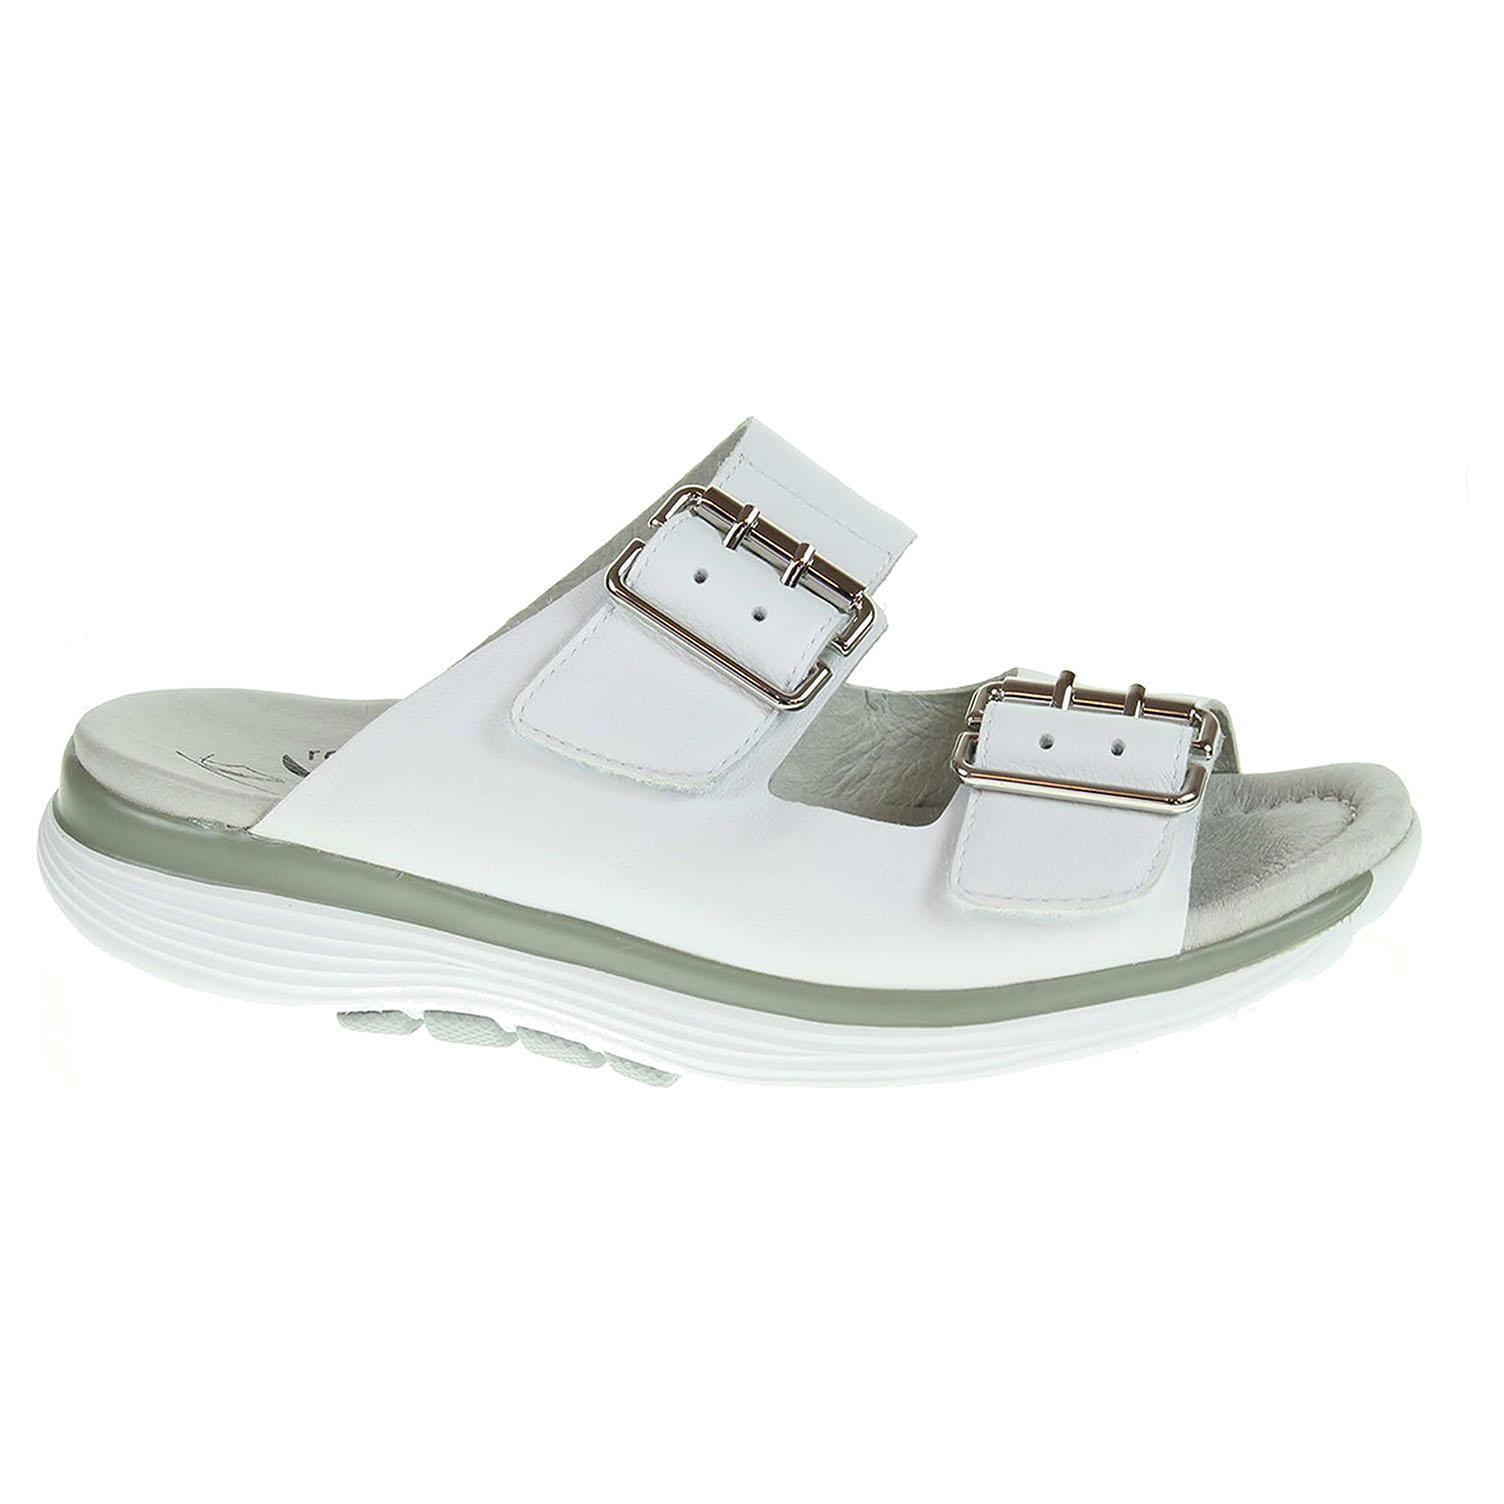 Ecco Dámské pantofle Gabor 66.910.50 bílé 23600792